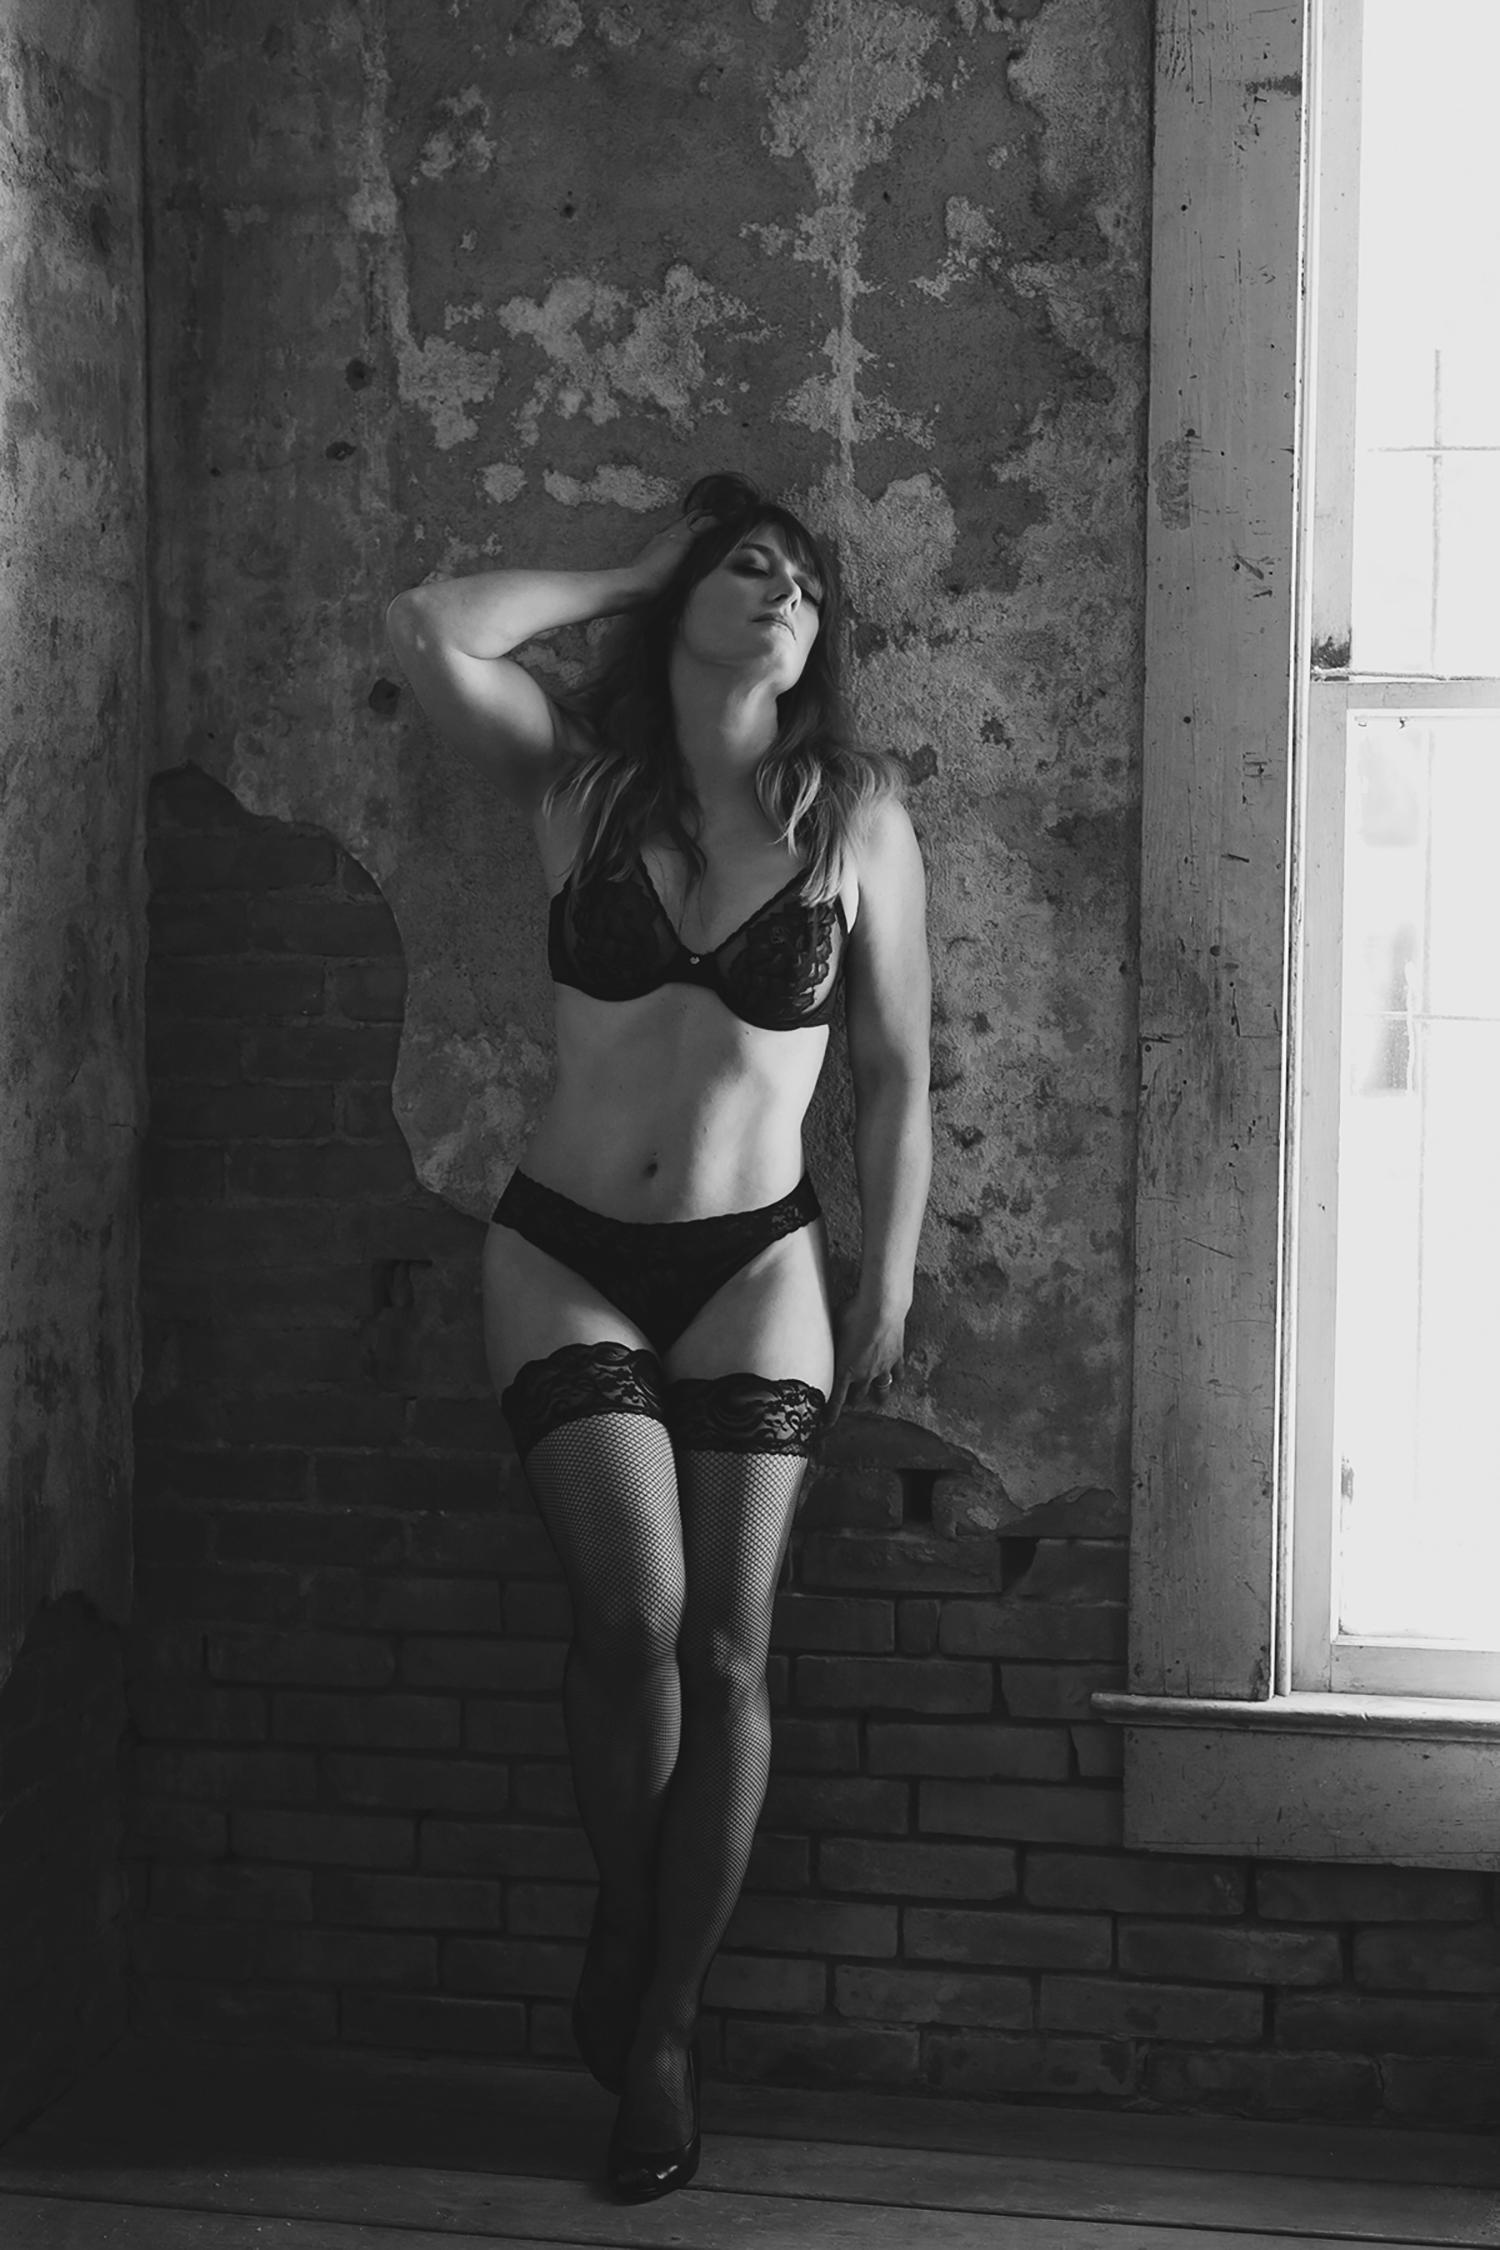 austin-atx-boudoir-artistic-nudes--kbb17.jpg